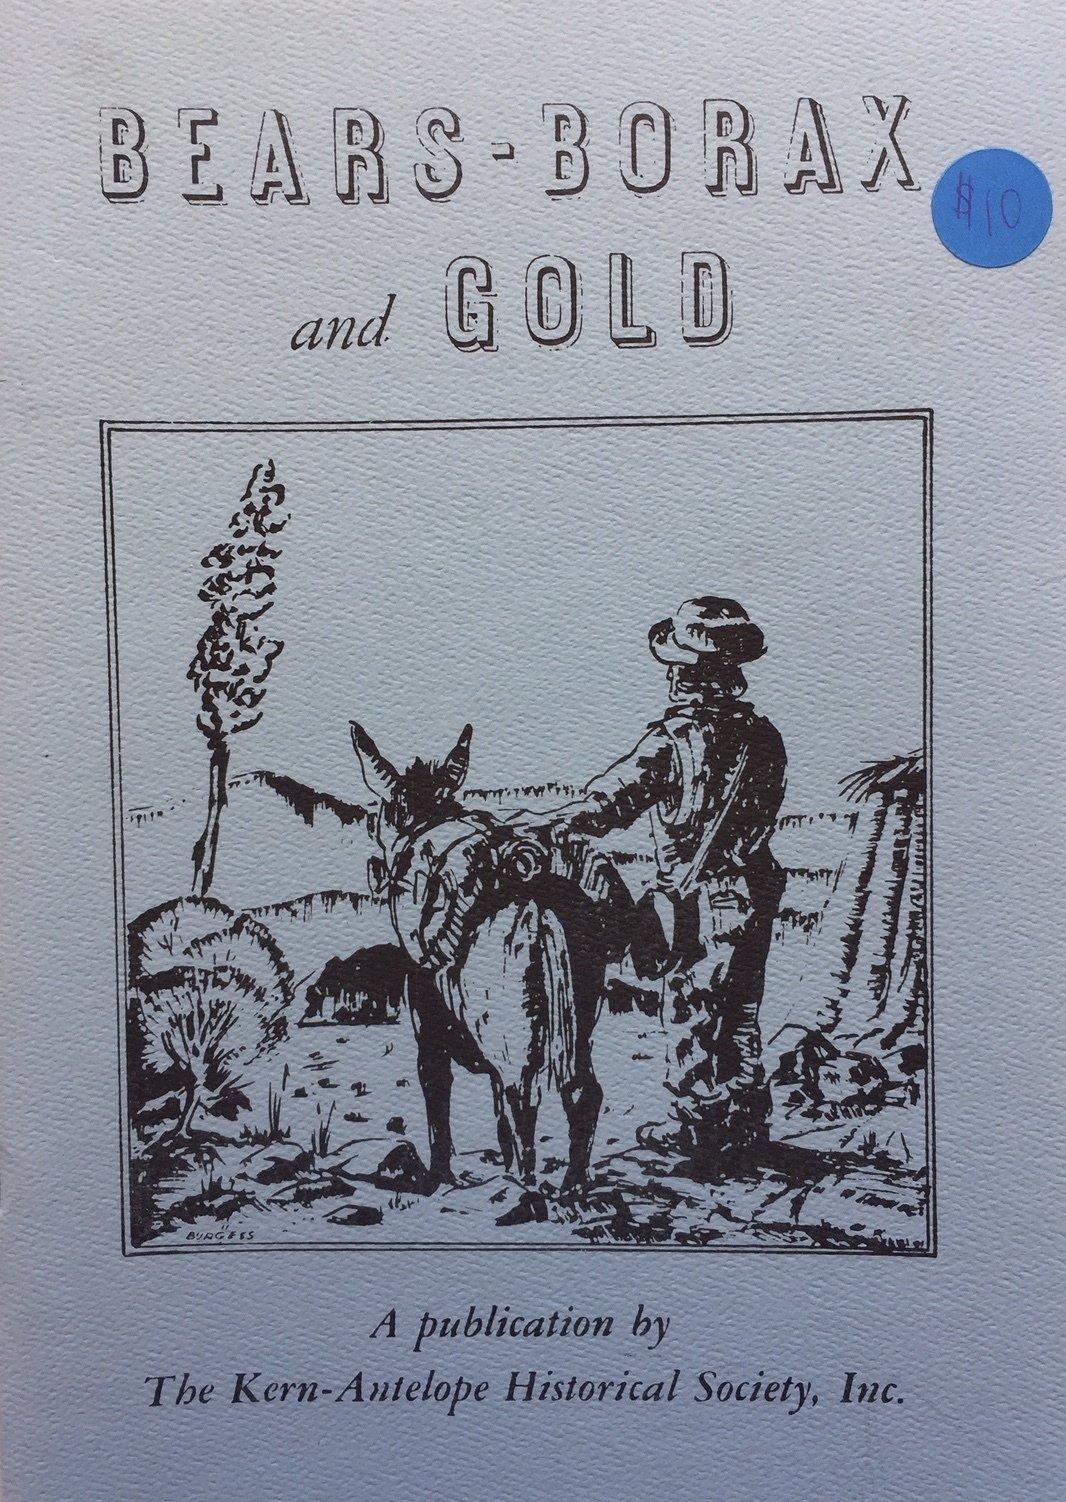 Bears-Borax and Gold 00003